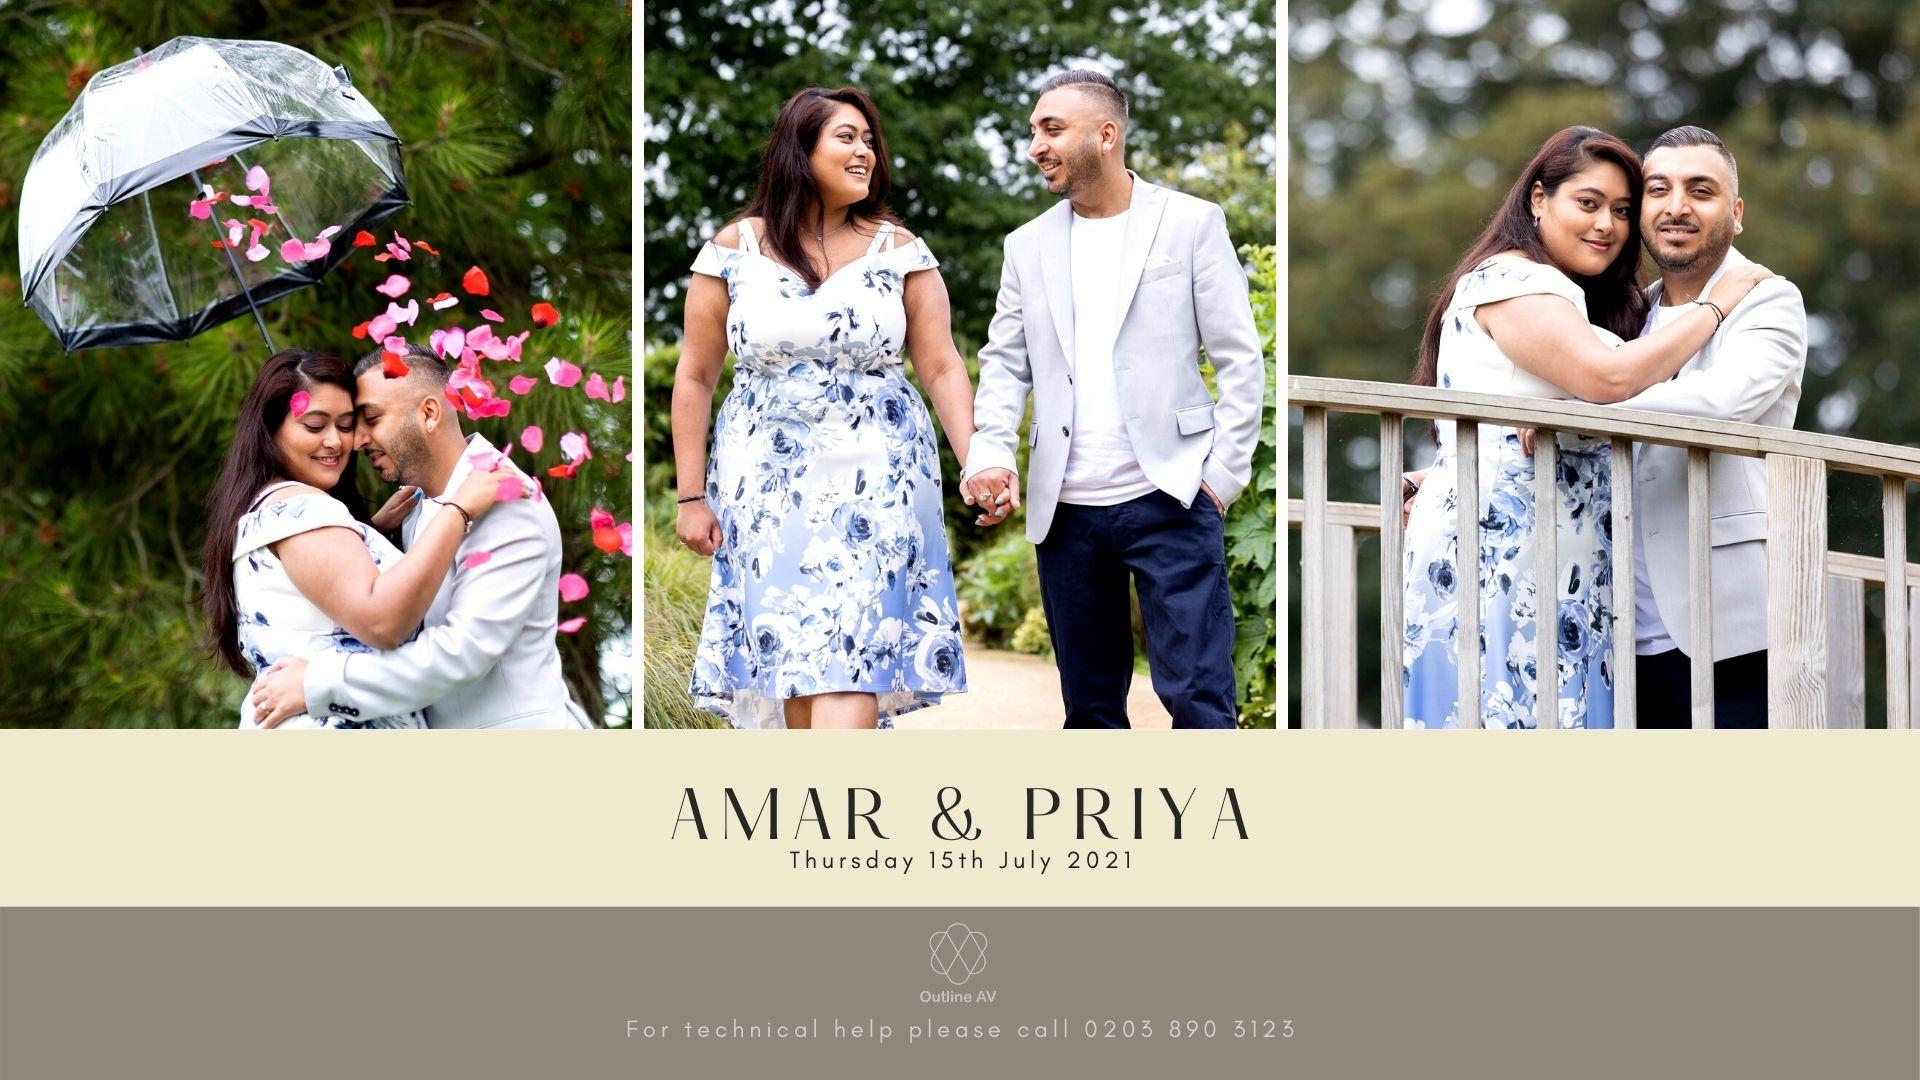 Amar & Priya - Live Stream